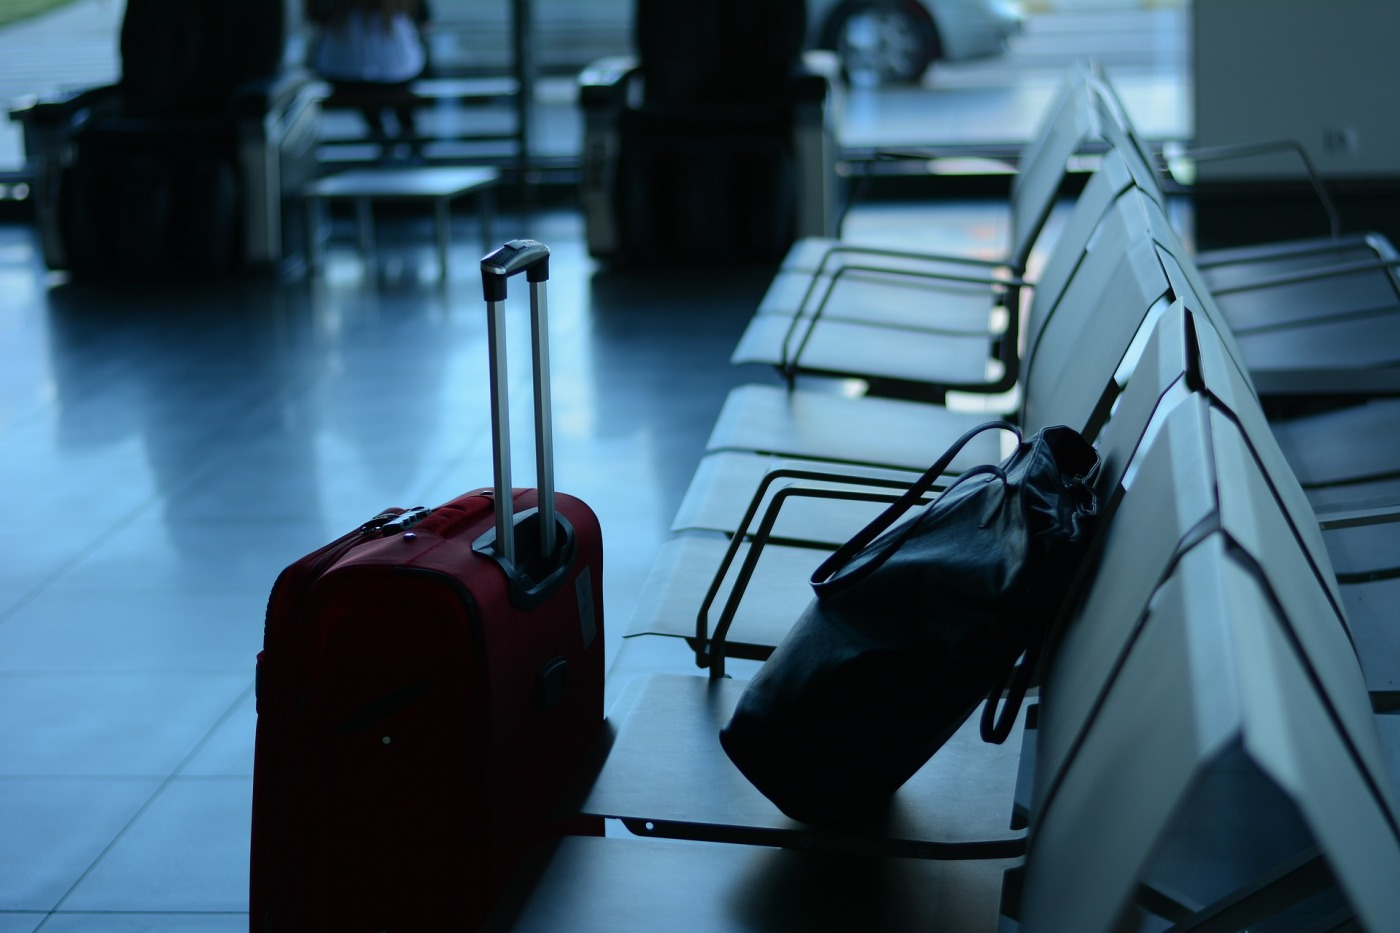 airport-519020_1920.jpg